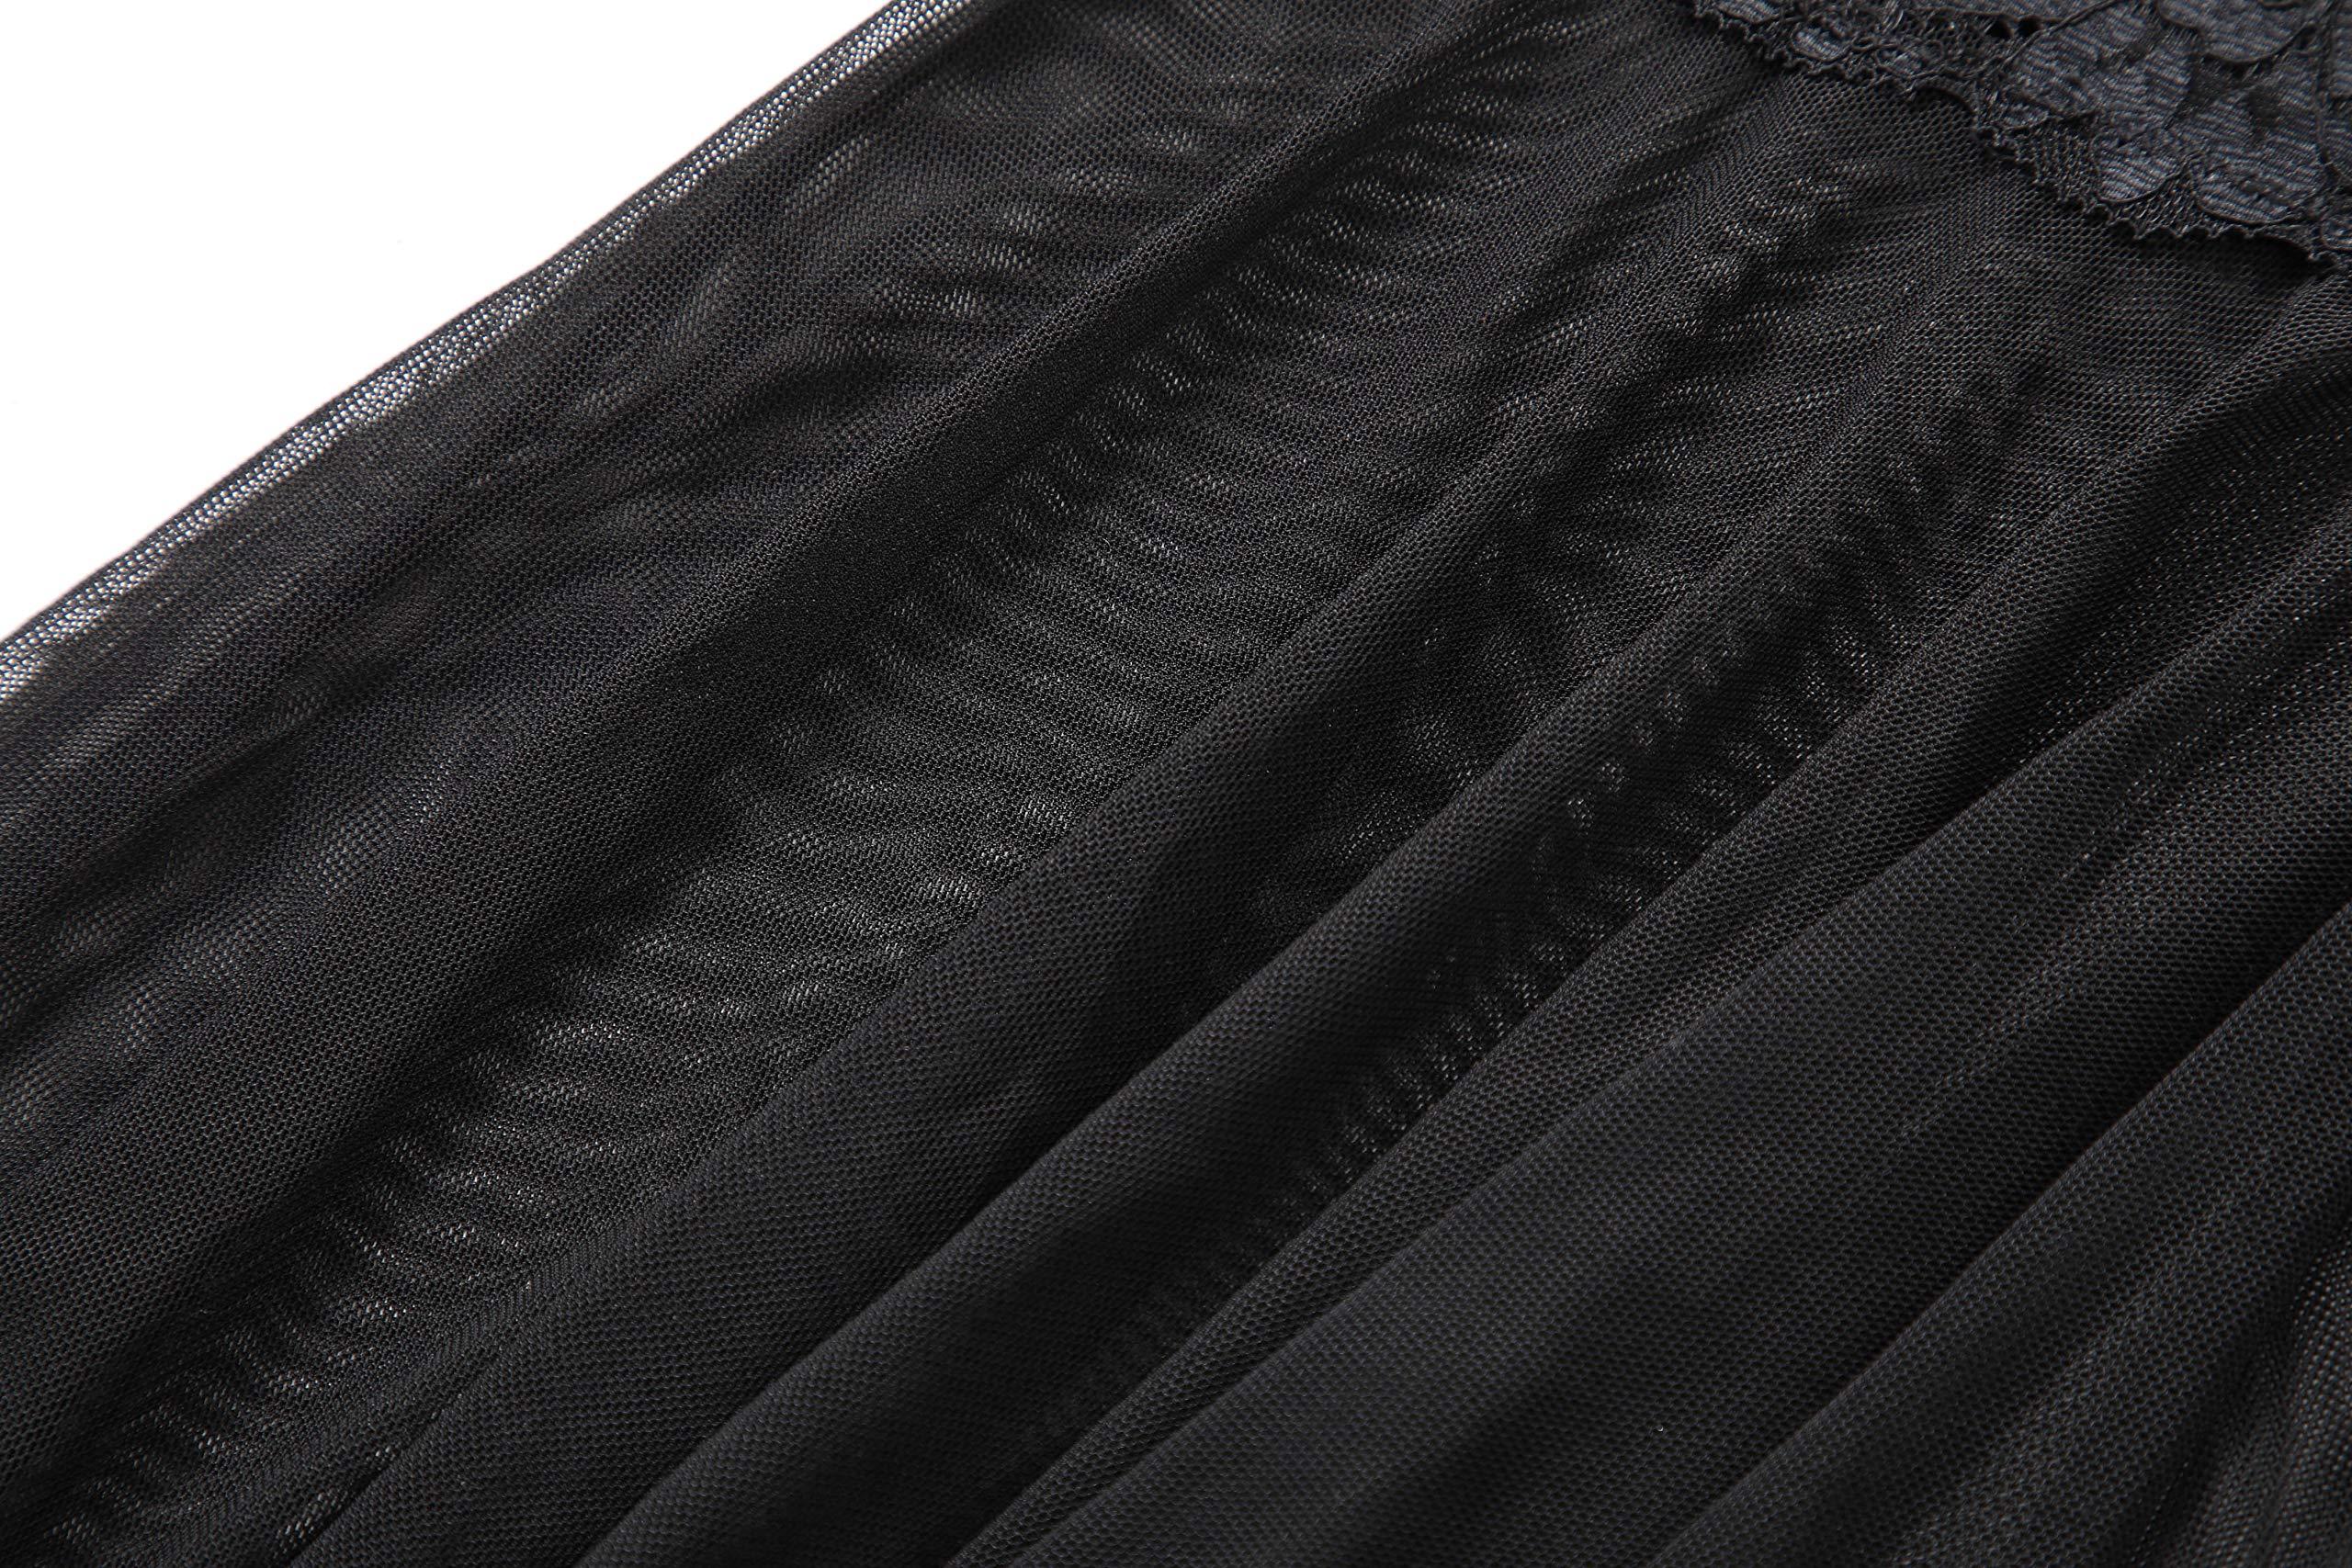 Marysay Women Babydoll Lingerie Sheer Lace Chemise Halter Backless Sleepwear (Black XX-Large)